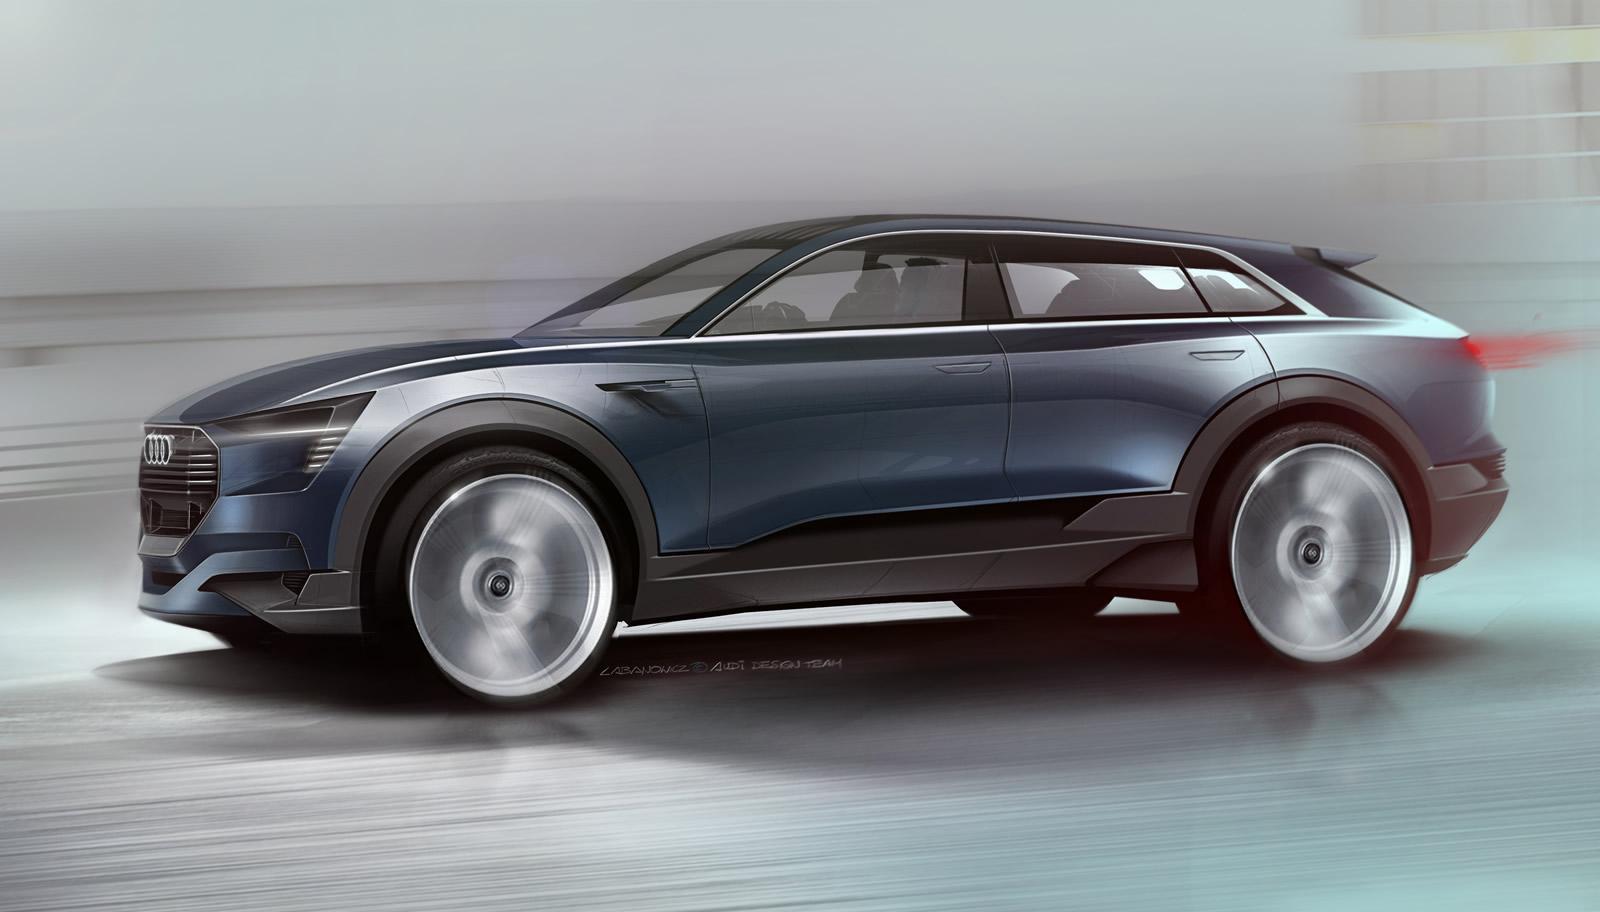 audi e tron quattro concept teaser shows future q6 electric suv for the first time autoevolution. Black Bedroom Furniture Sets. Home Design Ideas